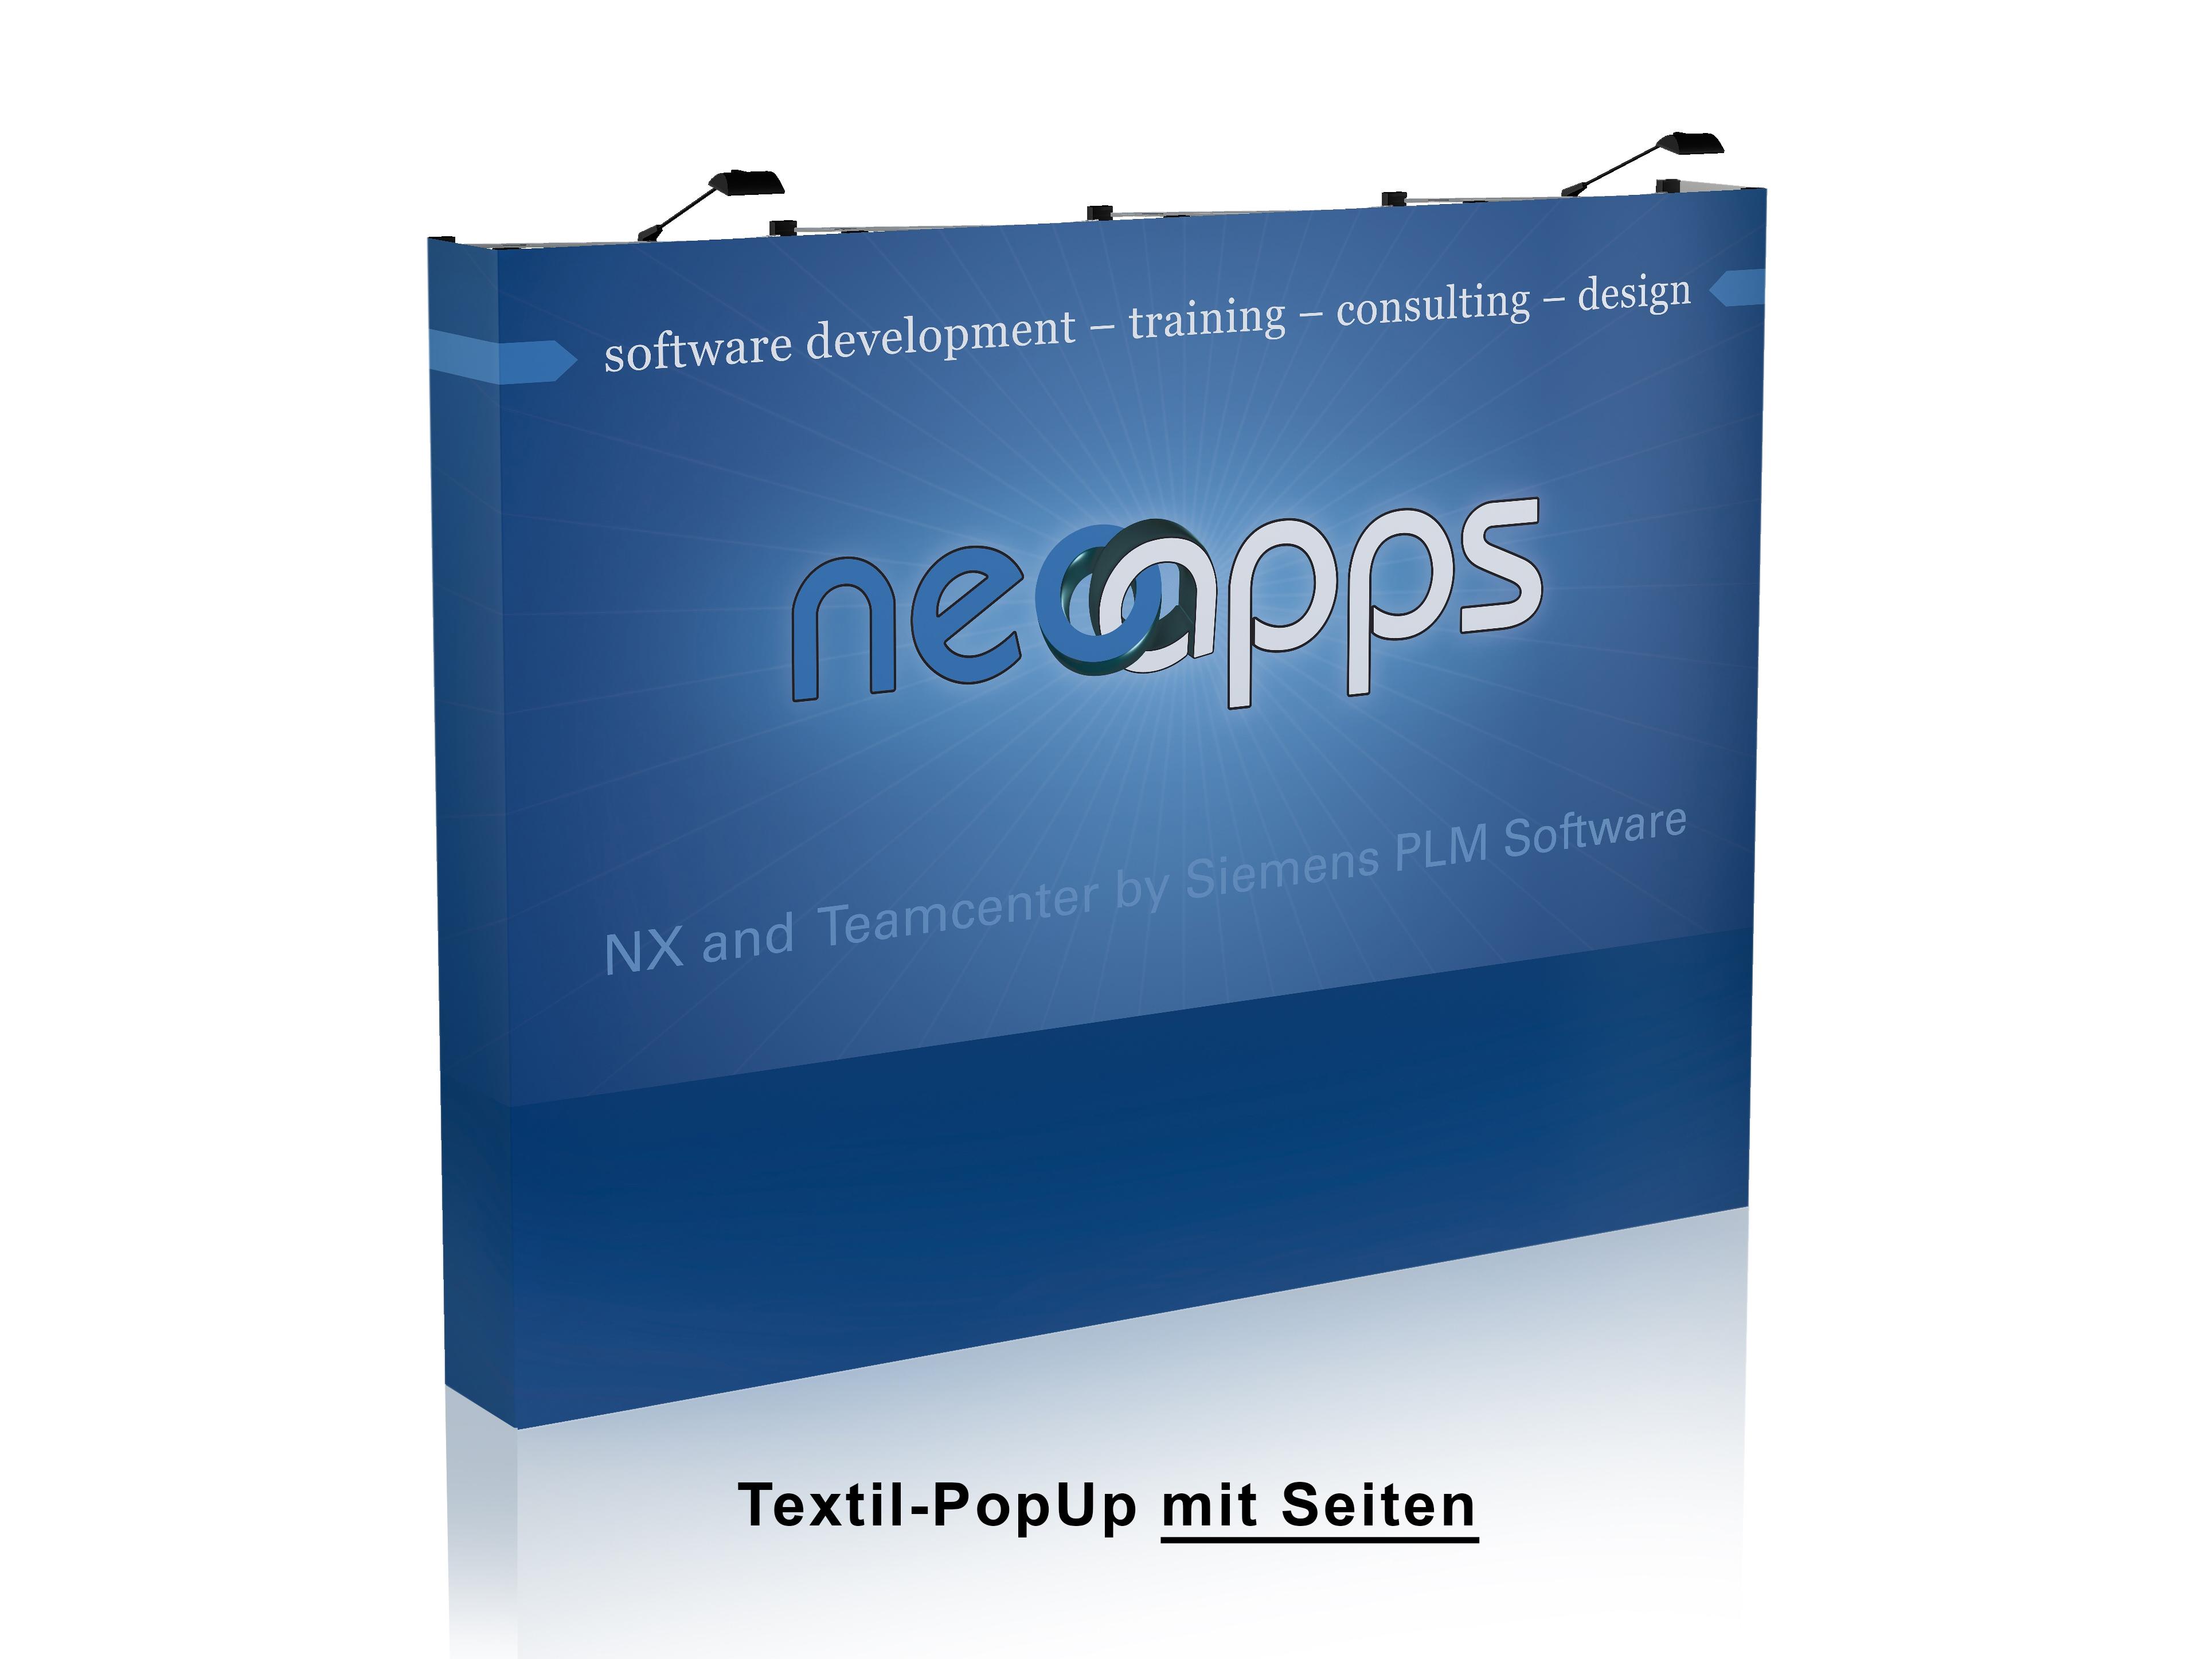 Textil PopUp 4x3 - Professional